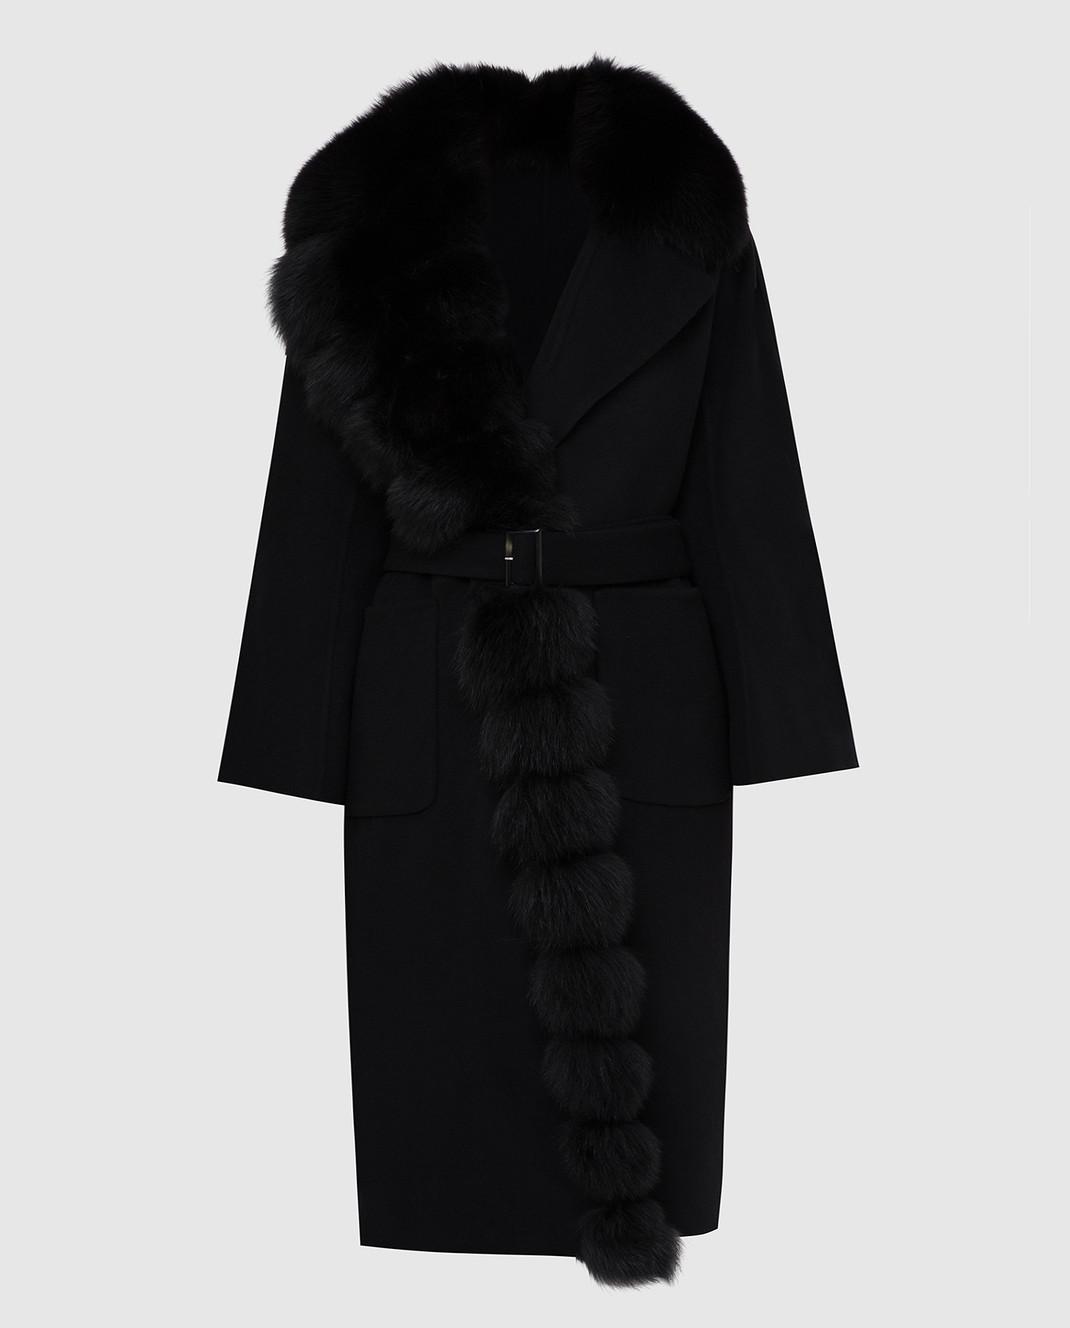 Ermanno Scervino Черное пальто из шерсти с мехом лисы D356D727VODDT